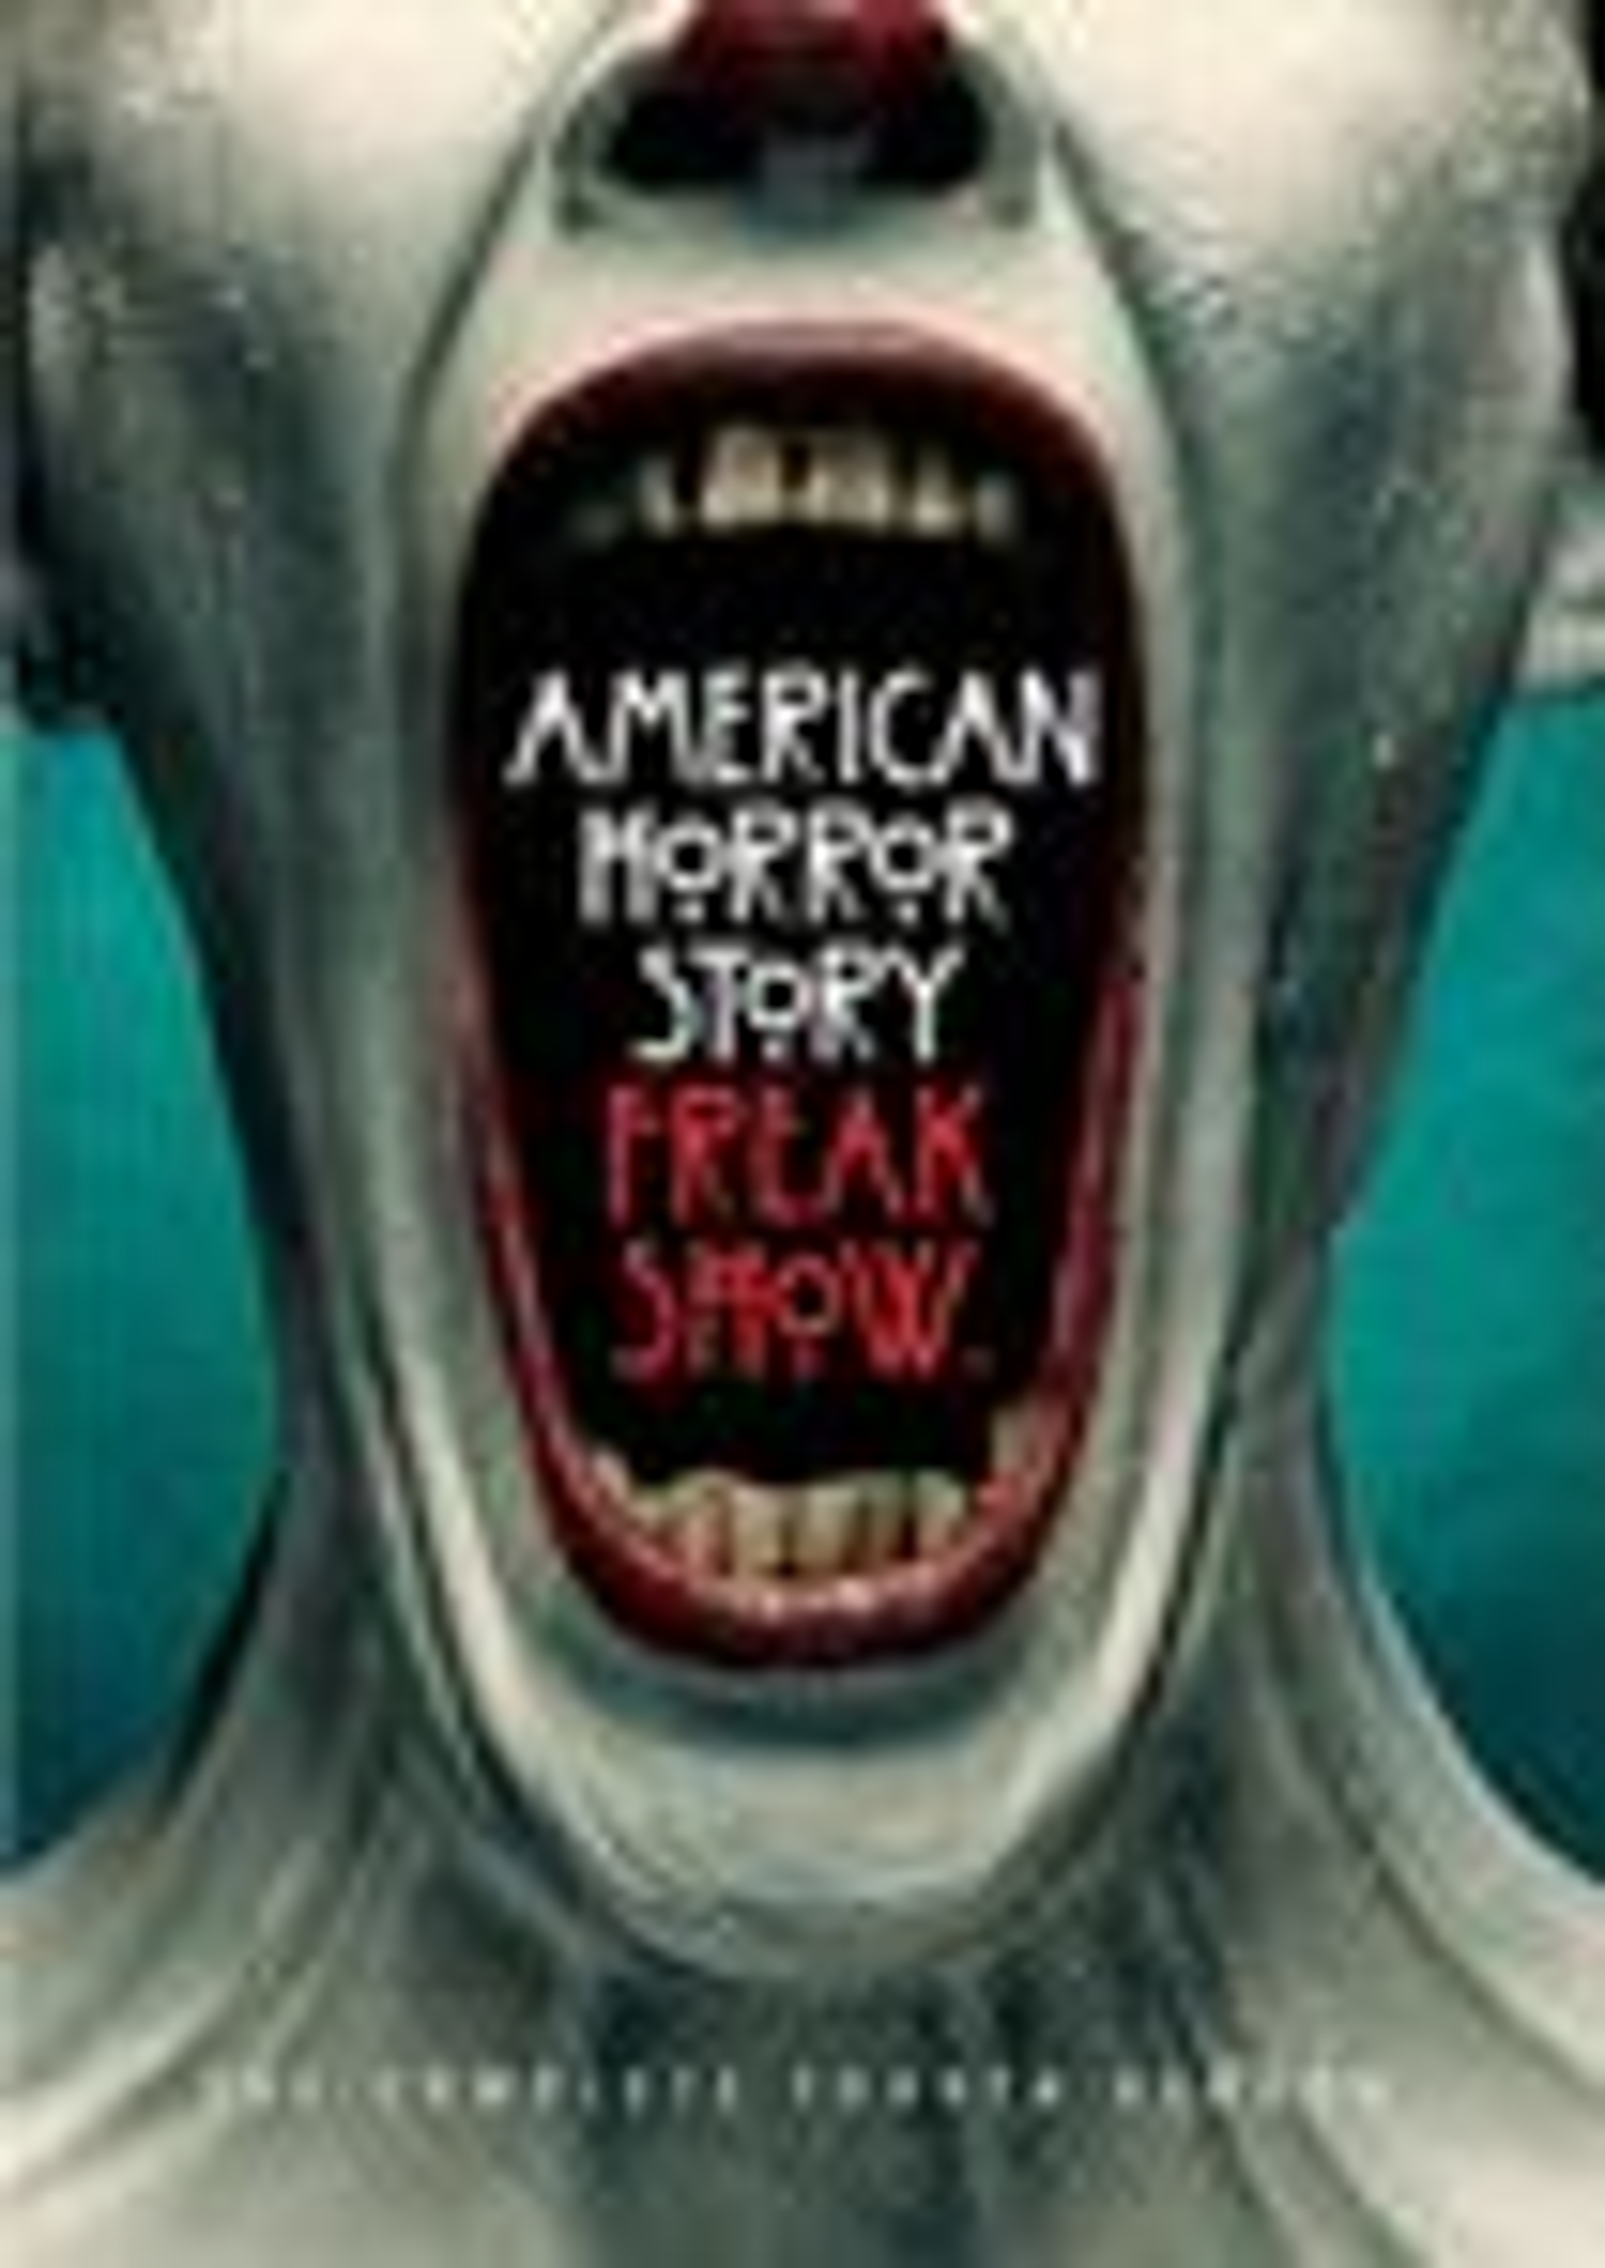 American Horror Story: Freak Show [4 Discs] (dvd) 4392111